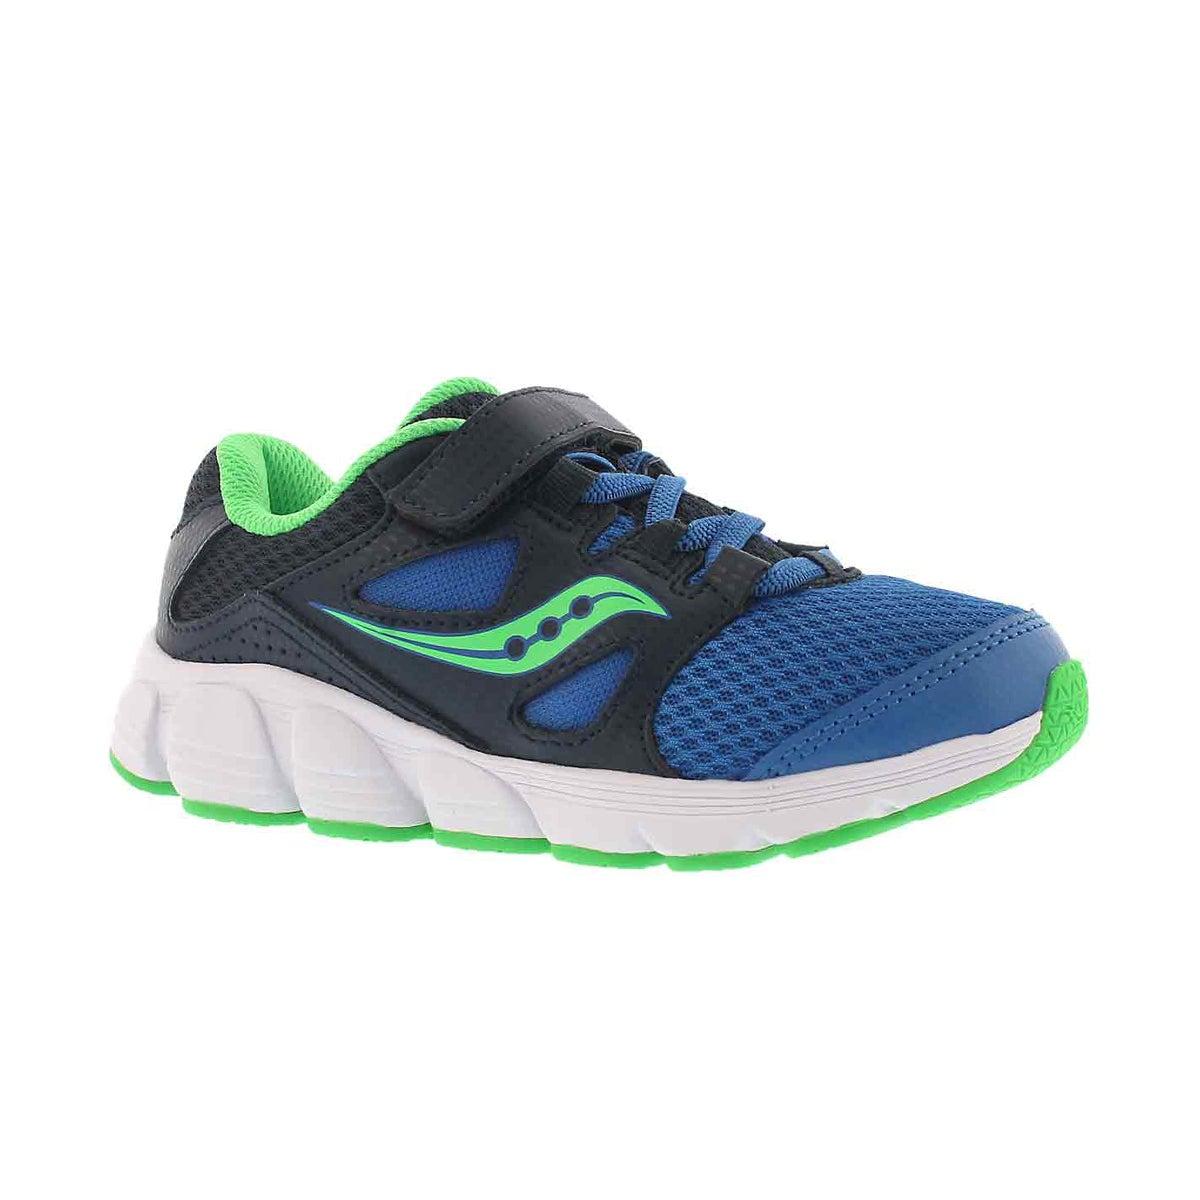 Boys' KOTARO 4 navy/green lace up runner